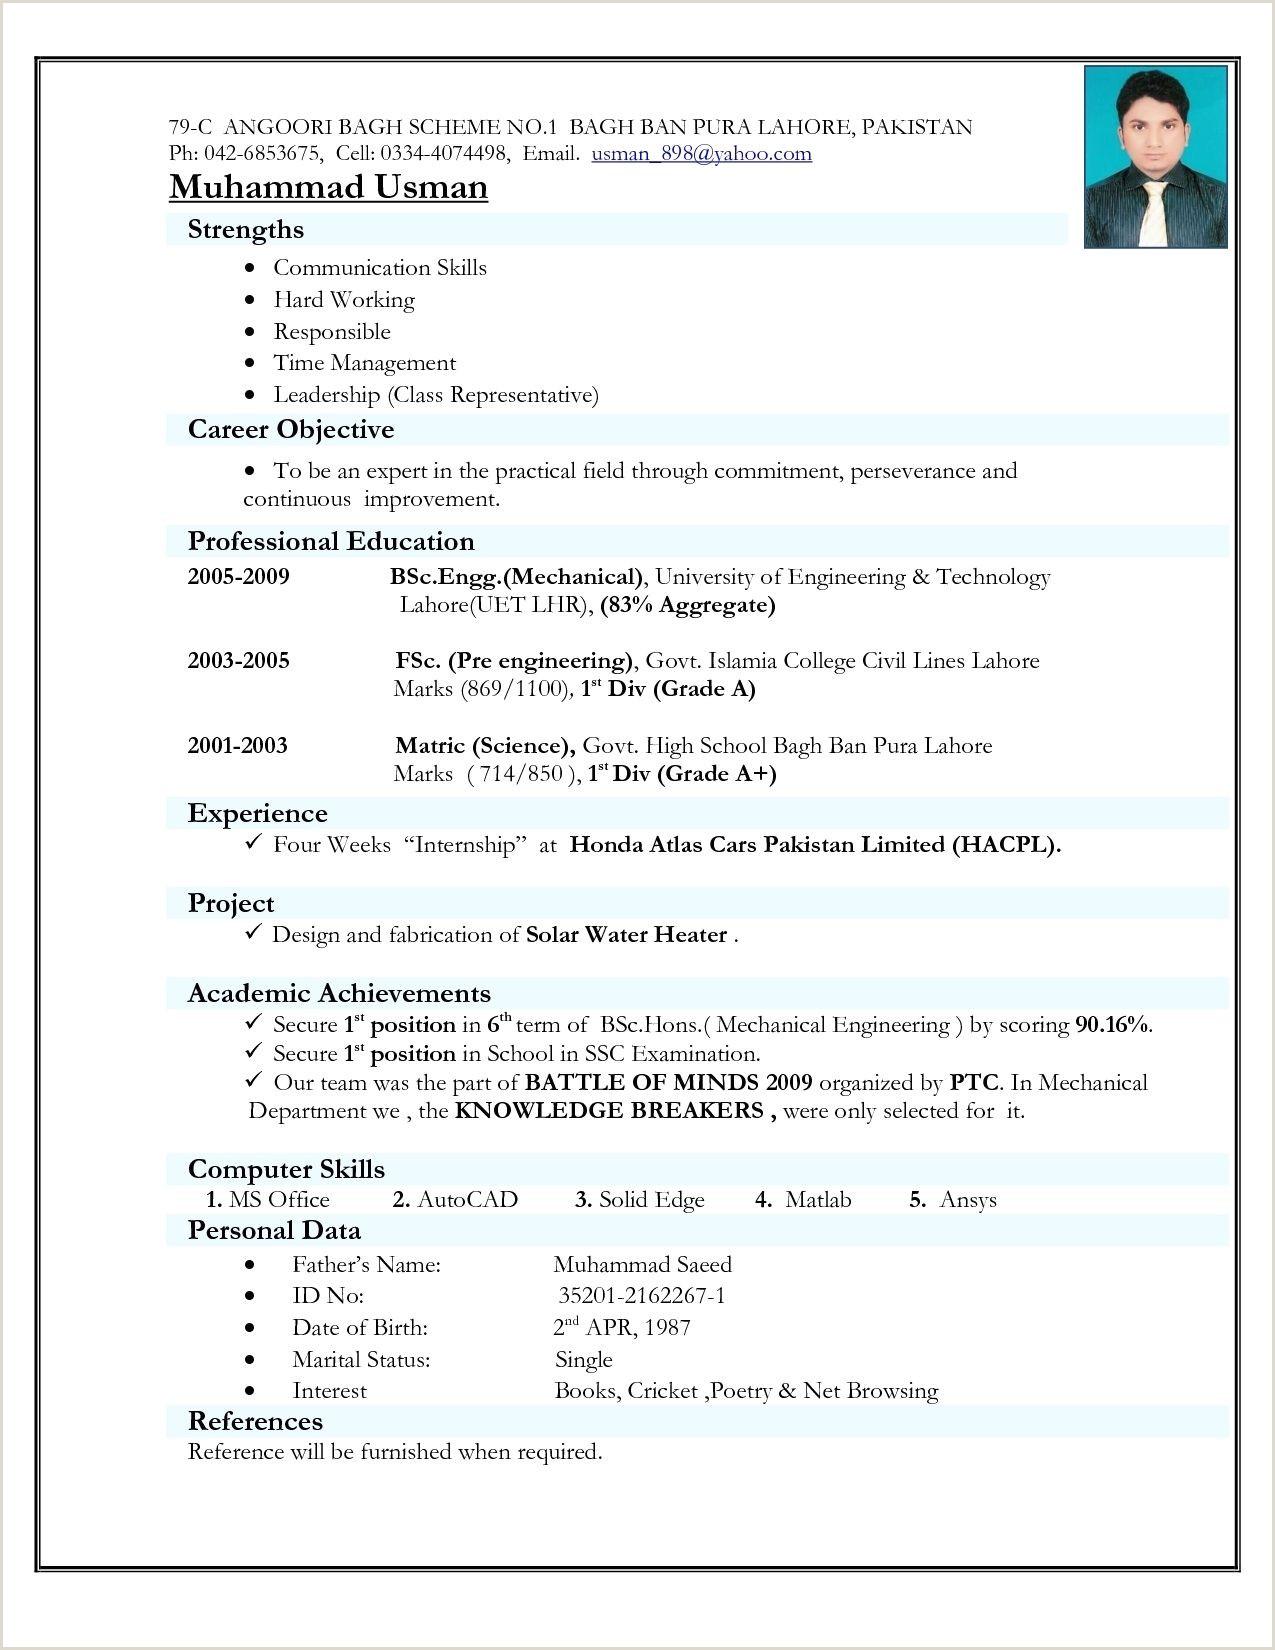 Resume Format India D